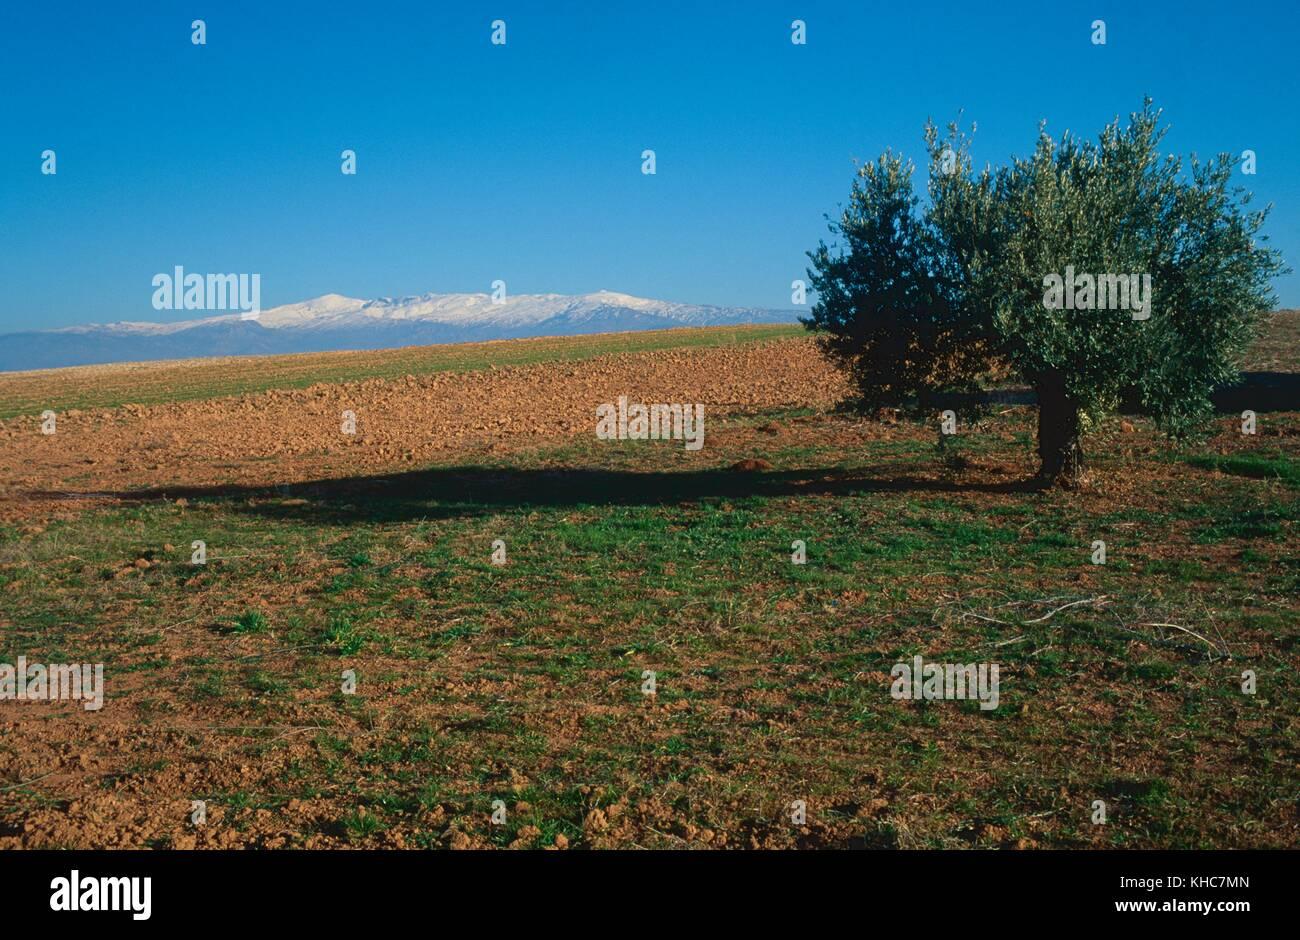 Fields, Olive, tree, Sierra Nevada, mountain, mountain range, snow, Escuzar, Province Granada, Andalusia, Spain - Stock Image